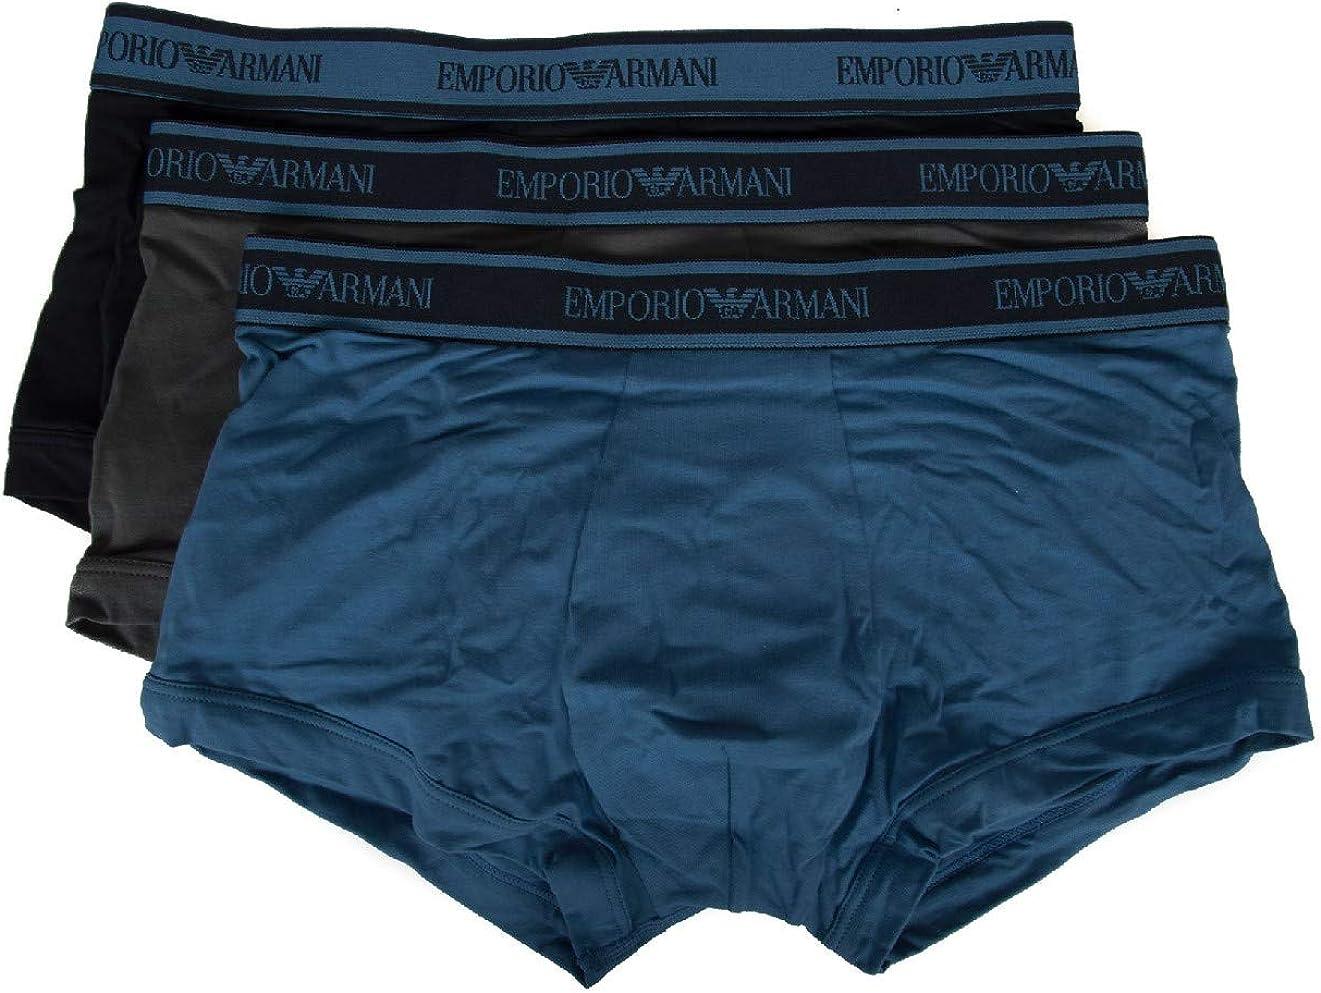 Emporio Armani Pack 3 Boxer Calzoncillos Hombre tripack artículo 111357 8A717